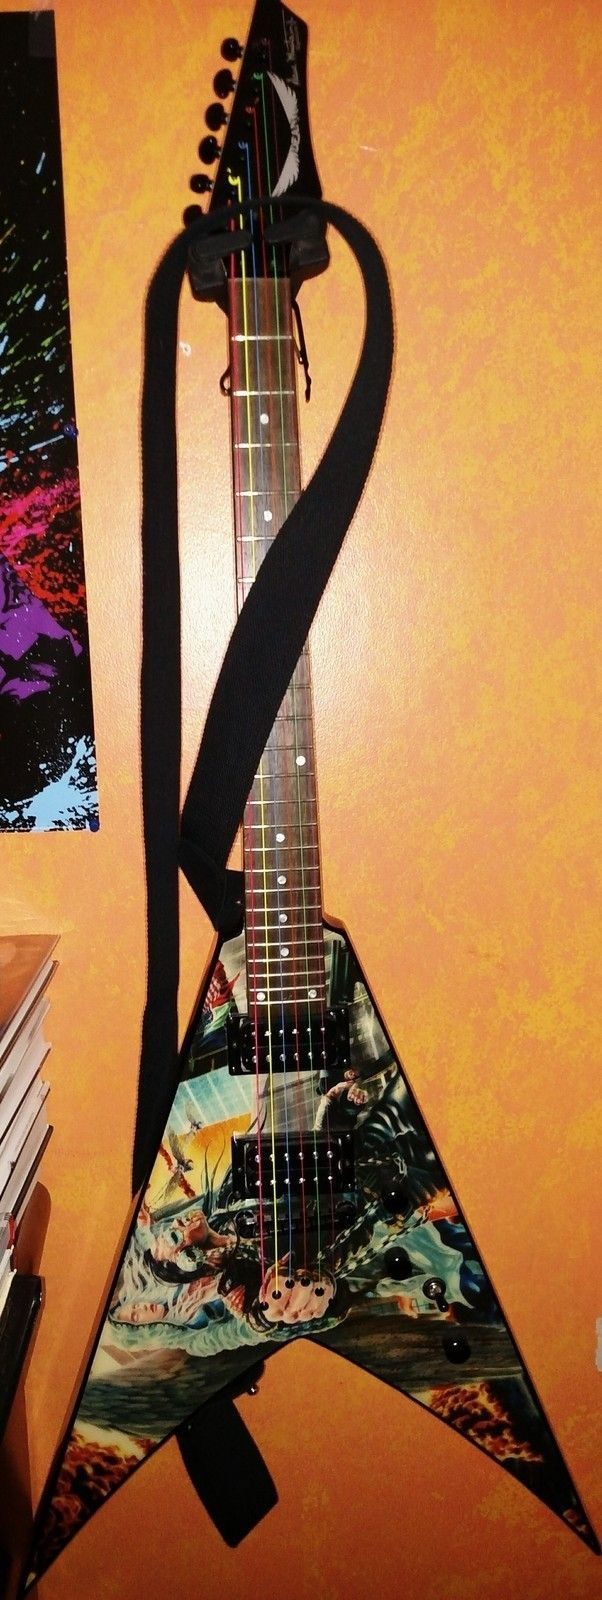 Guitar Players in O Forum... - IMG_20150220_130226.jpg